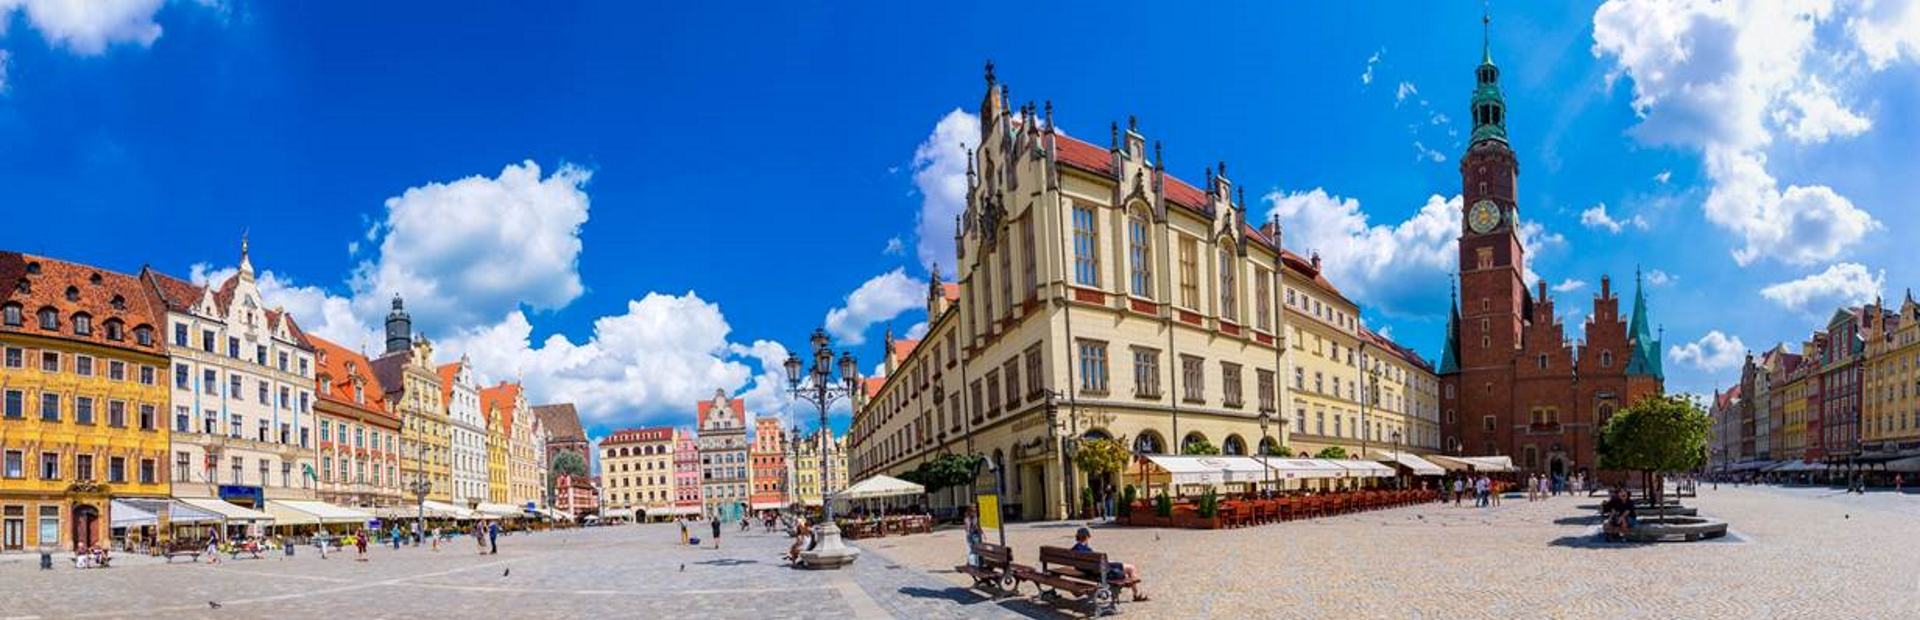 town_square_poland